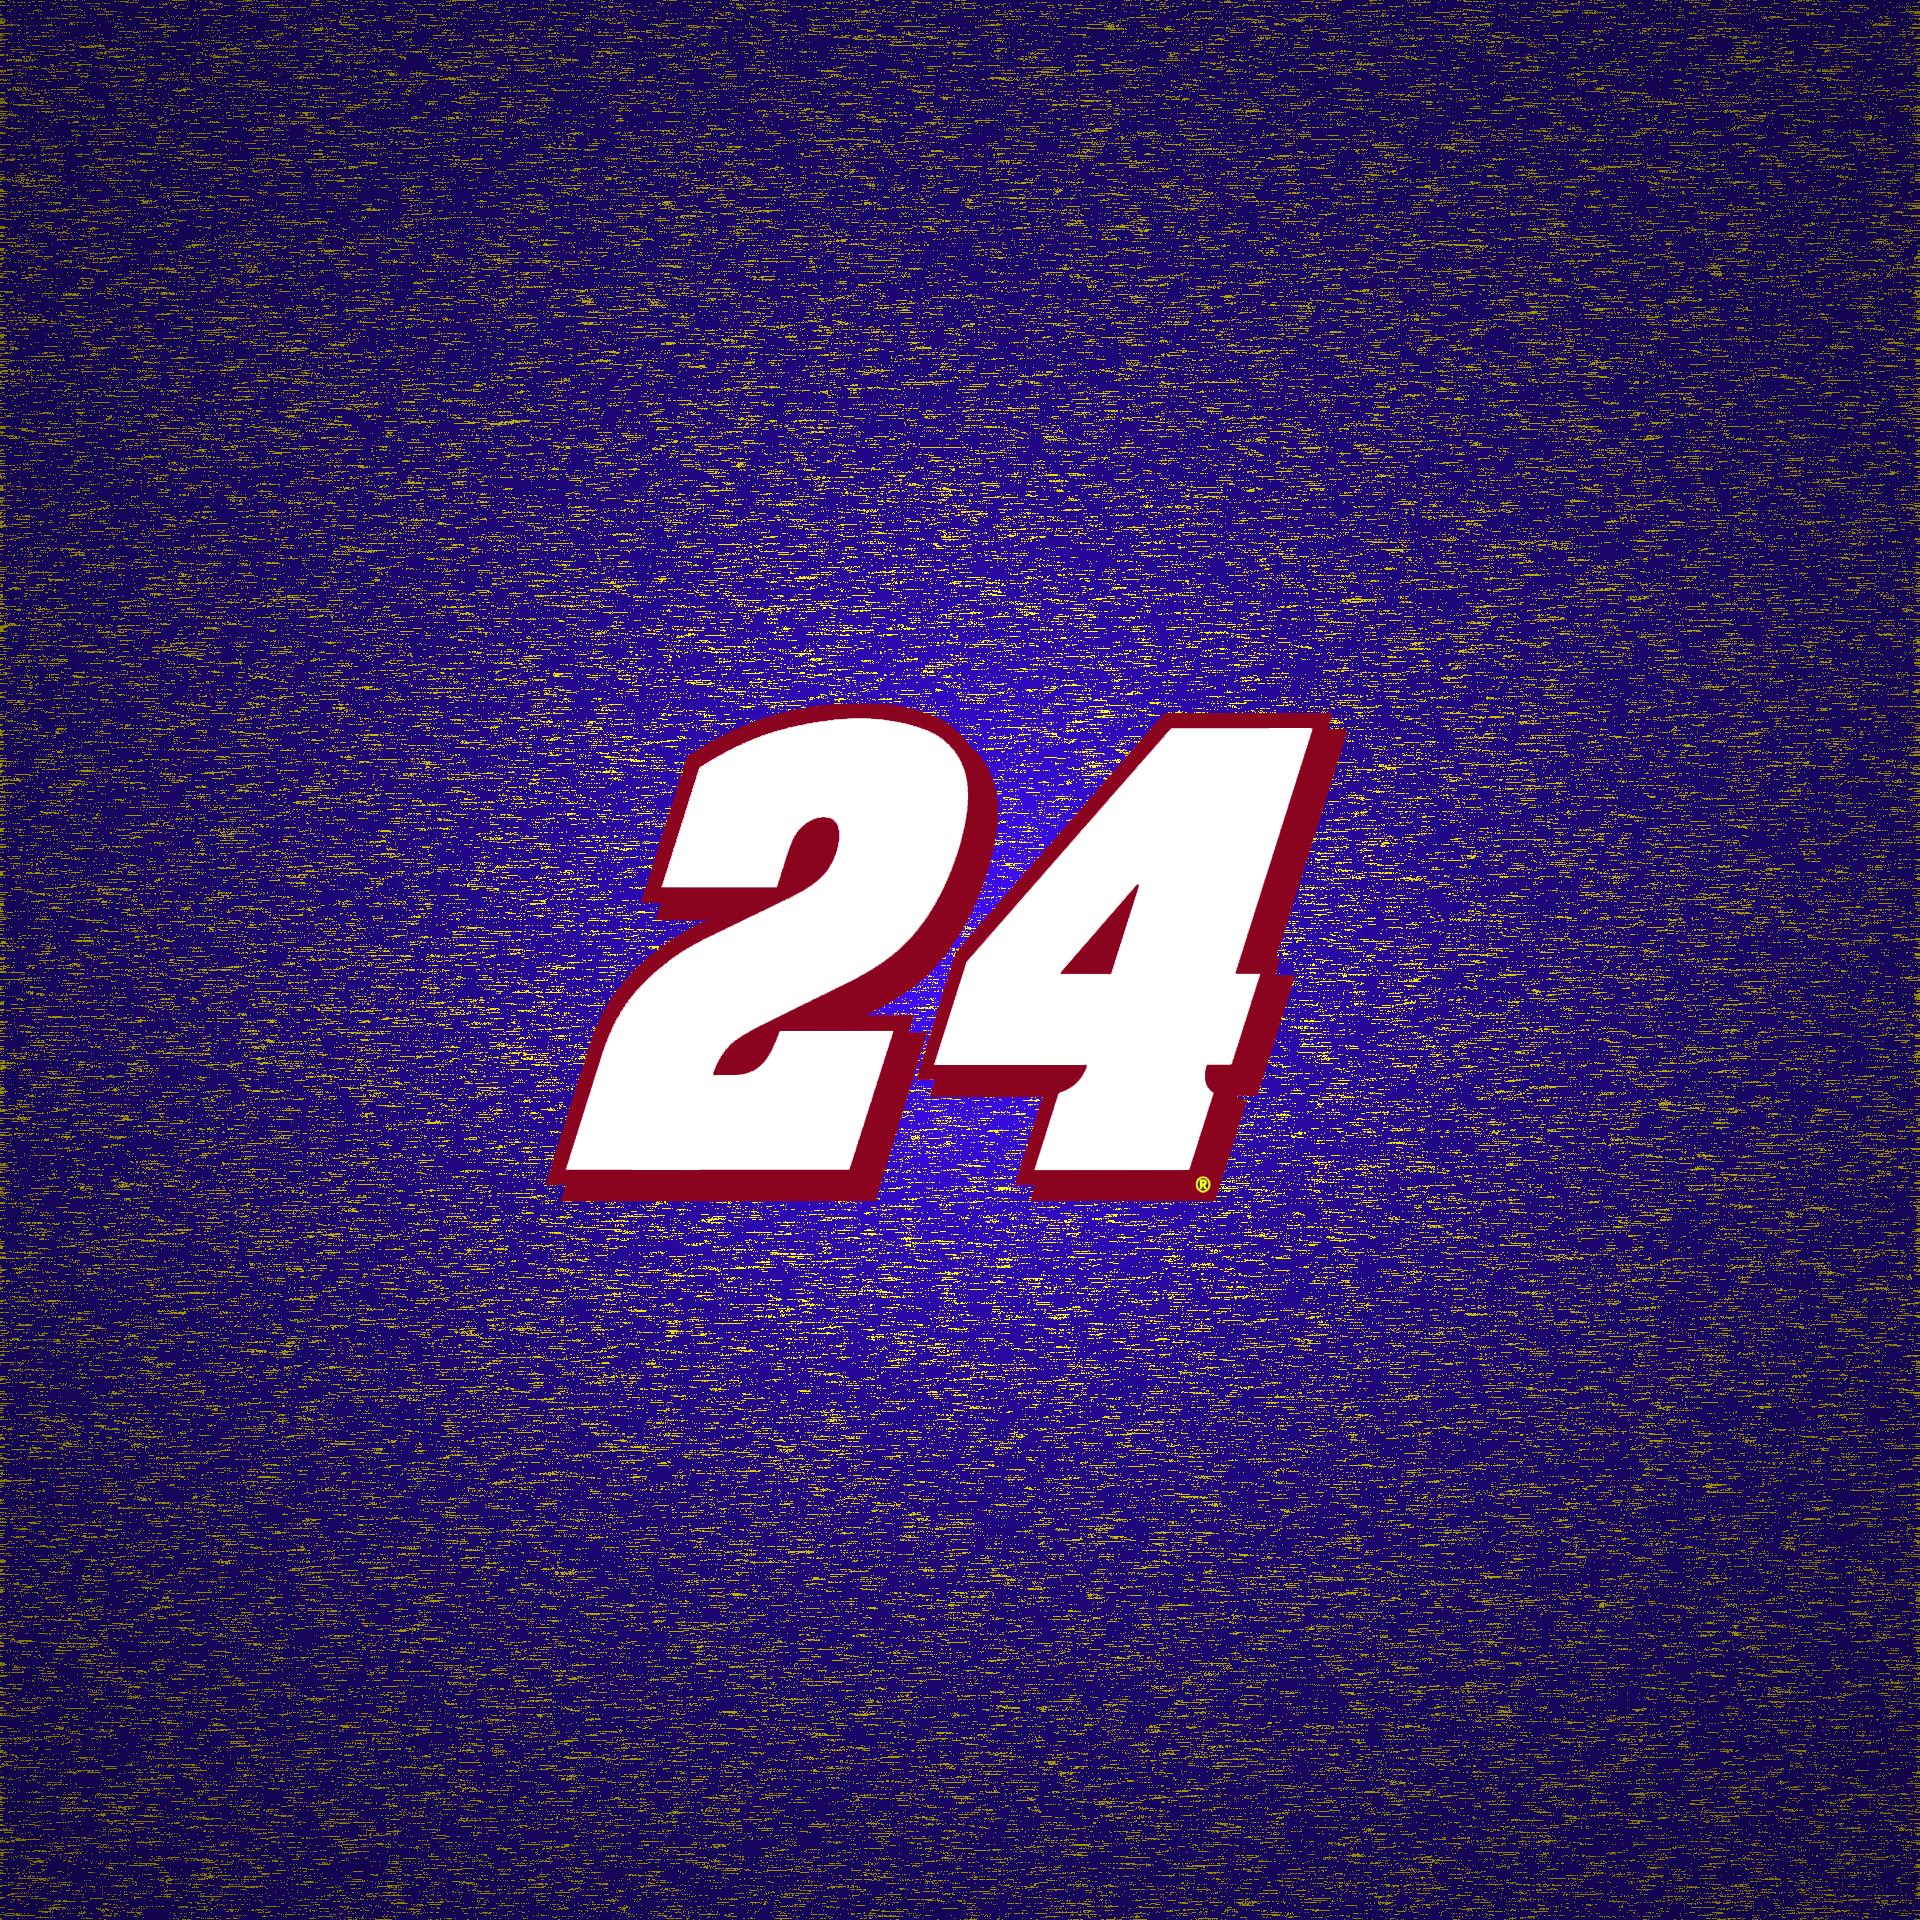 download Cindys Wallpapers chase elliott 24 car logo 1920x1920